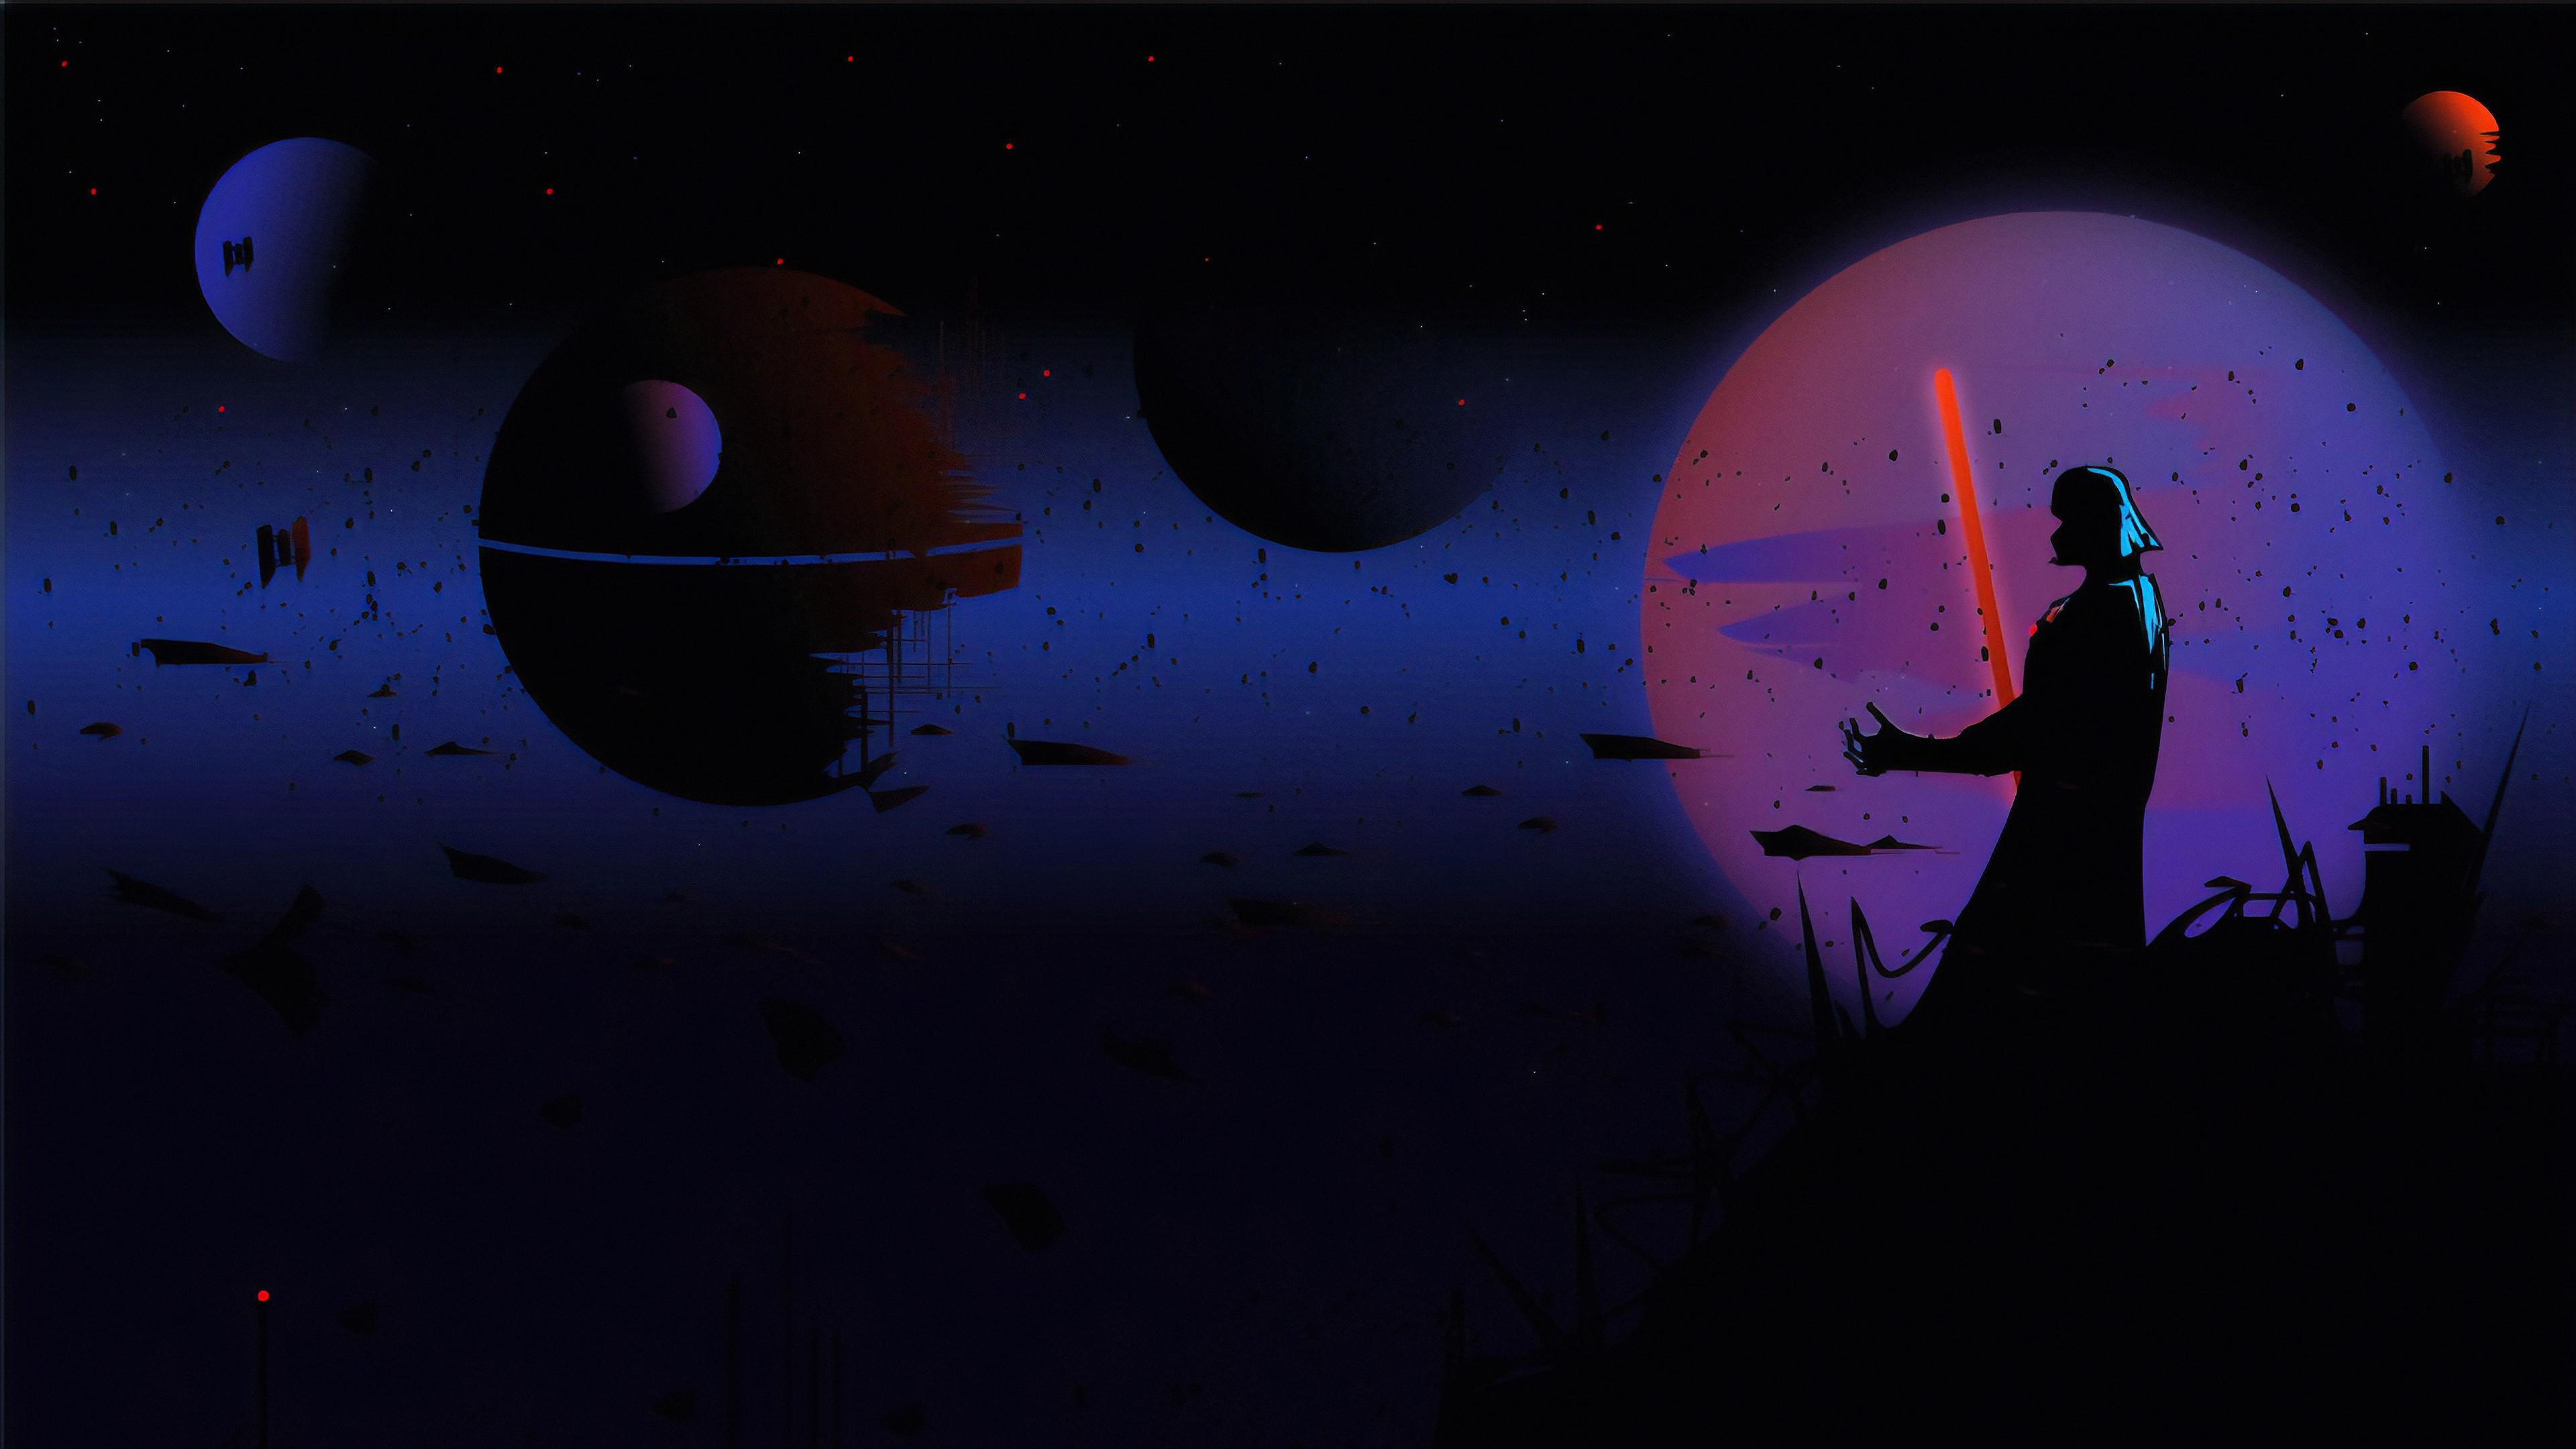 Darth Vader Digital Art Wallpaper Hd Artist 4k Wallpapers Images Photos And Background